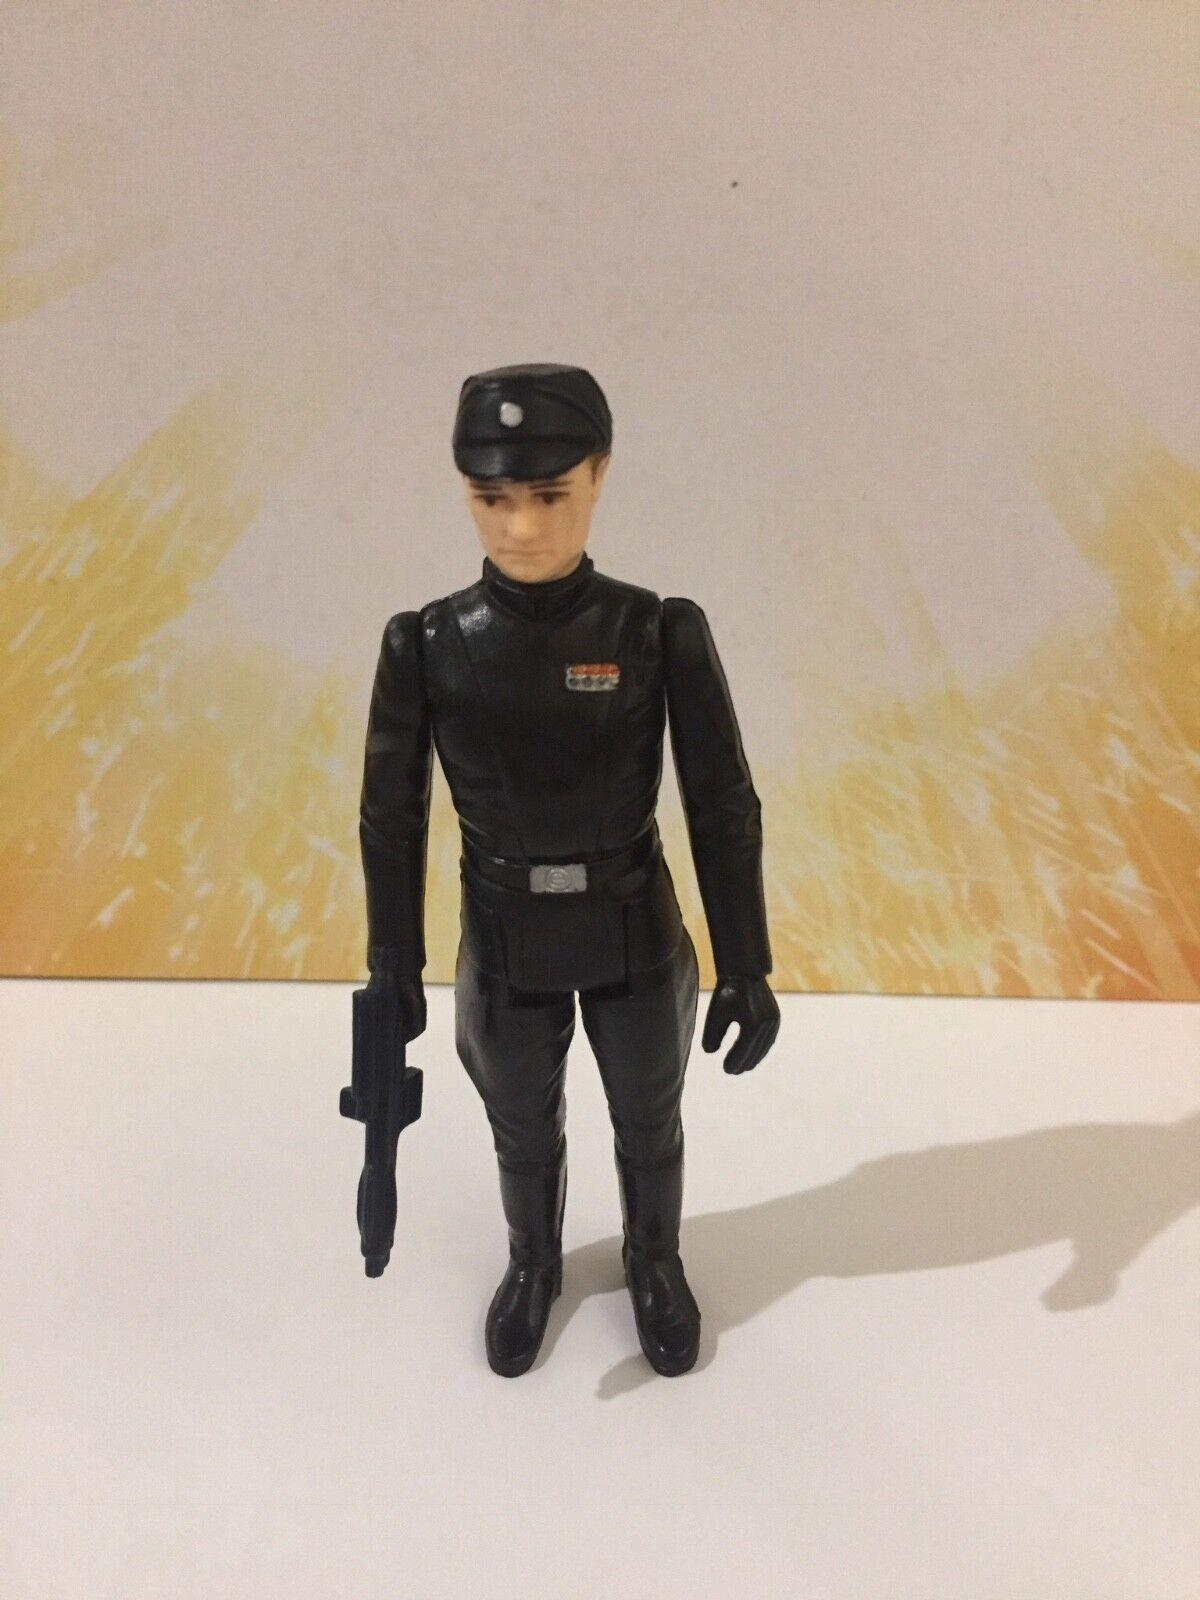 Vintage Star Wars Imperial Commander by Kenner